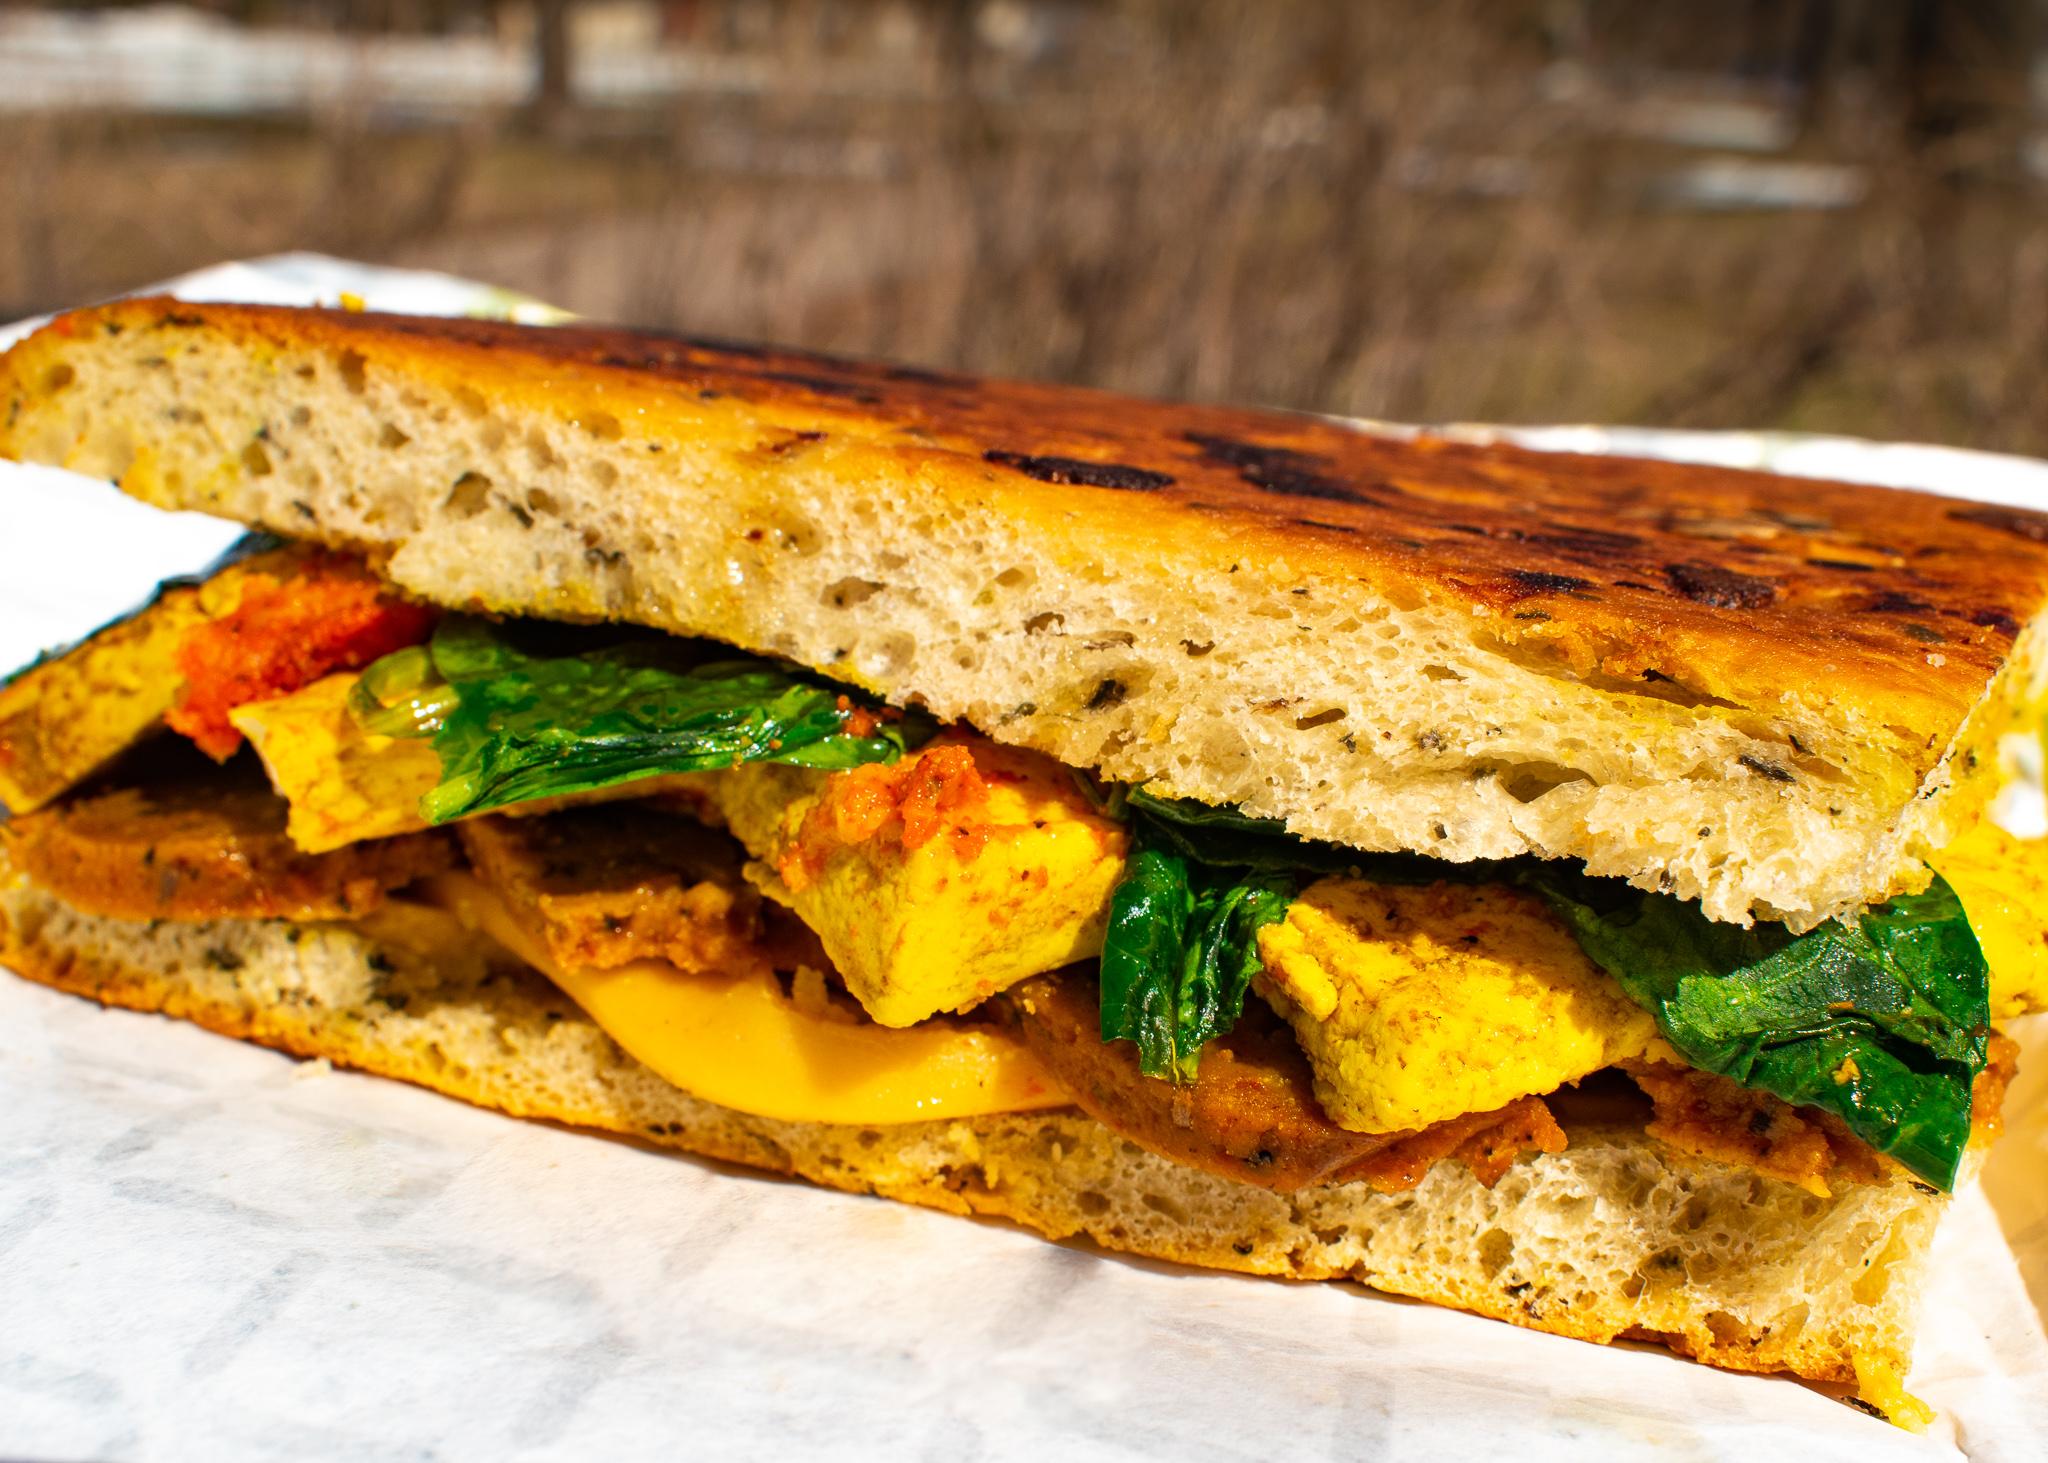 uprooted-traveler-herbivorous-butcher-sandwich-breakfast-vegan-minneapolis-st-paul.jpg